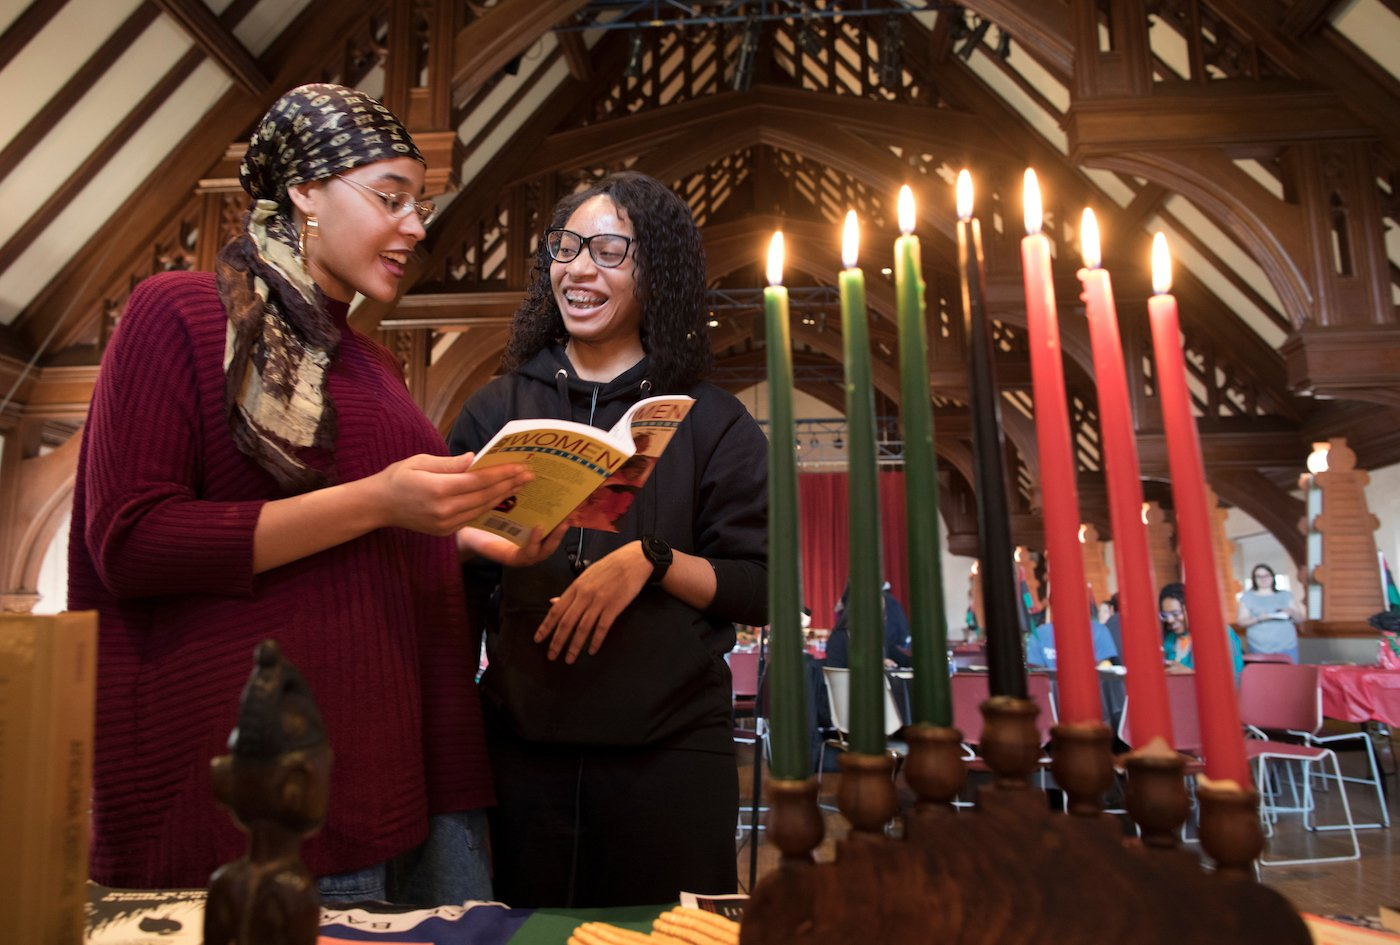 Two women lighting Kwanzaa candles